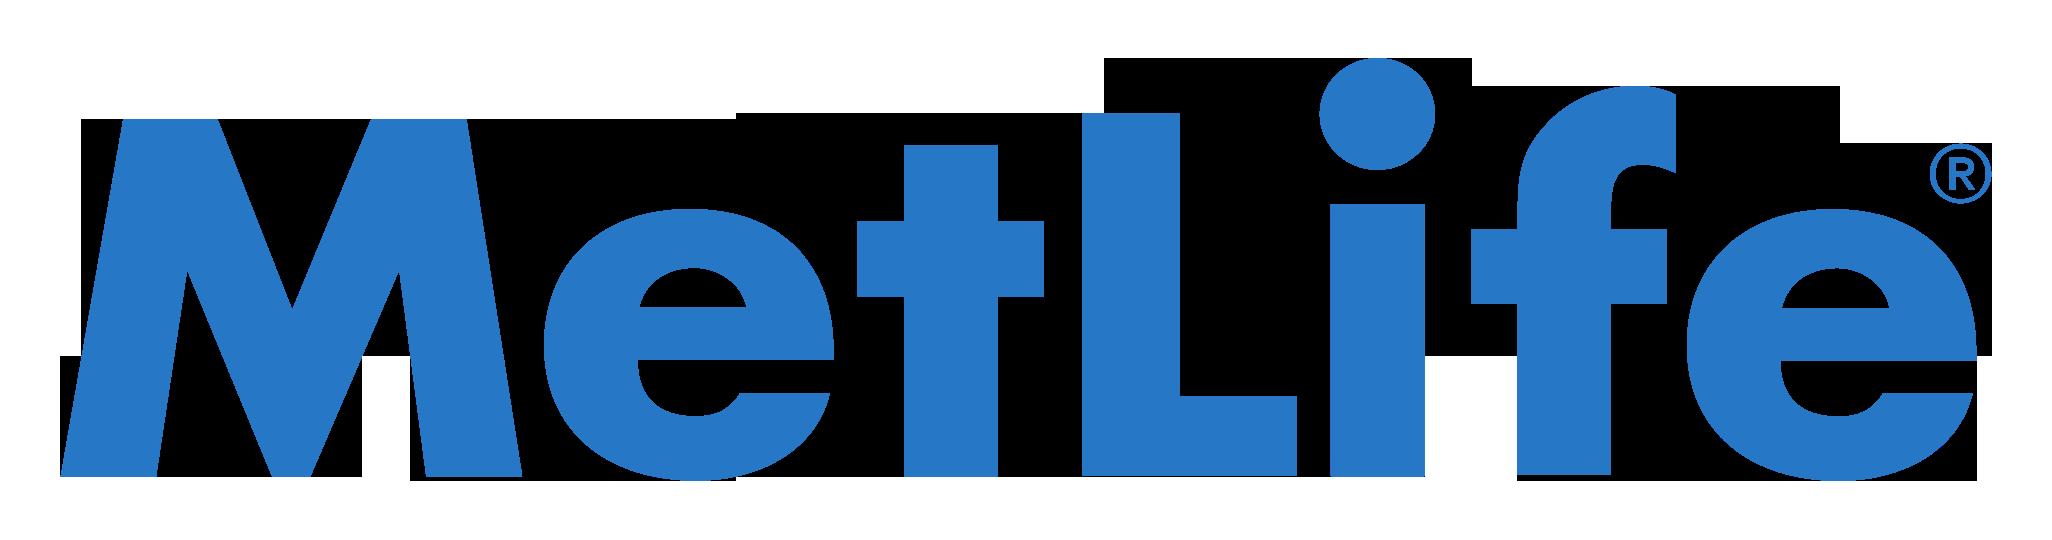 MetLife_Transparent